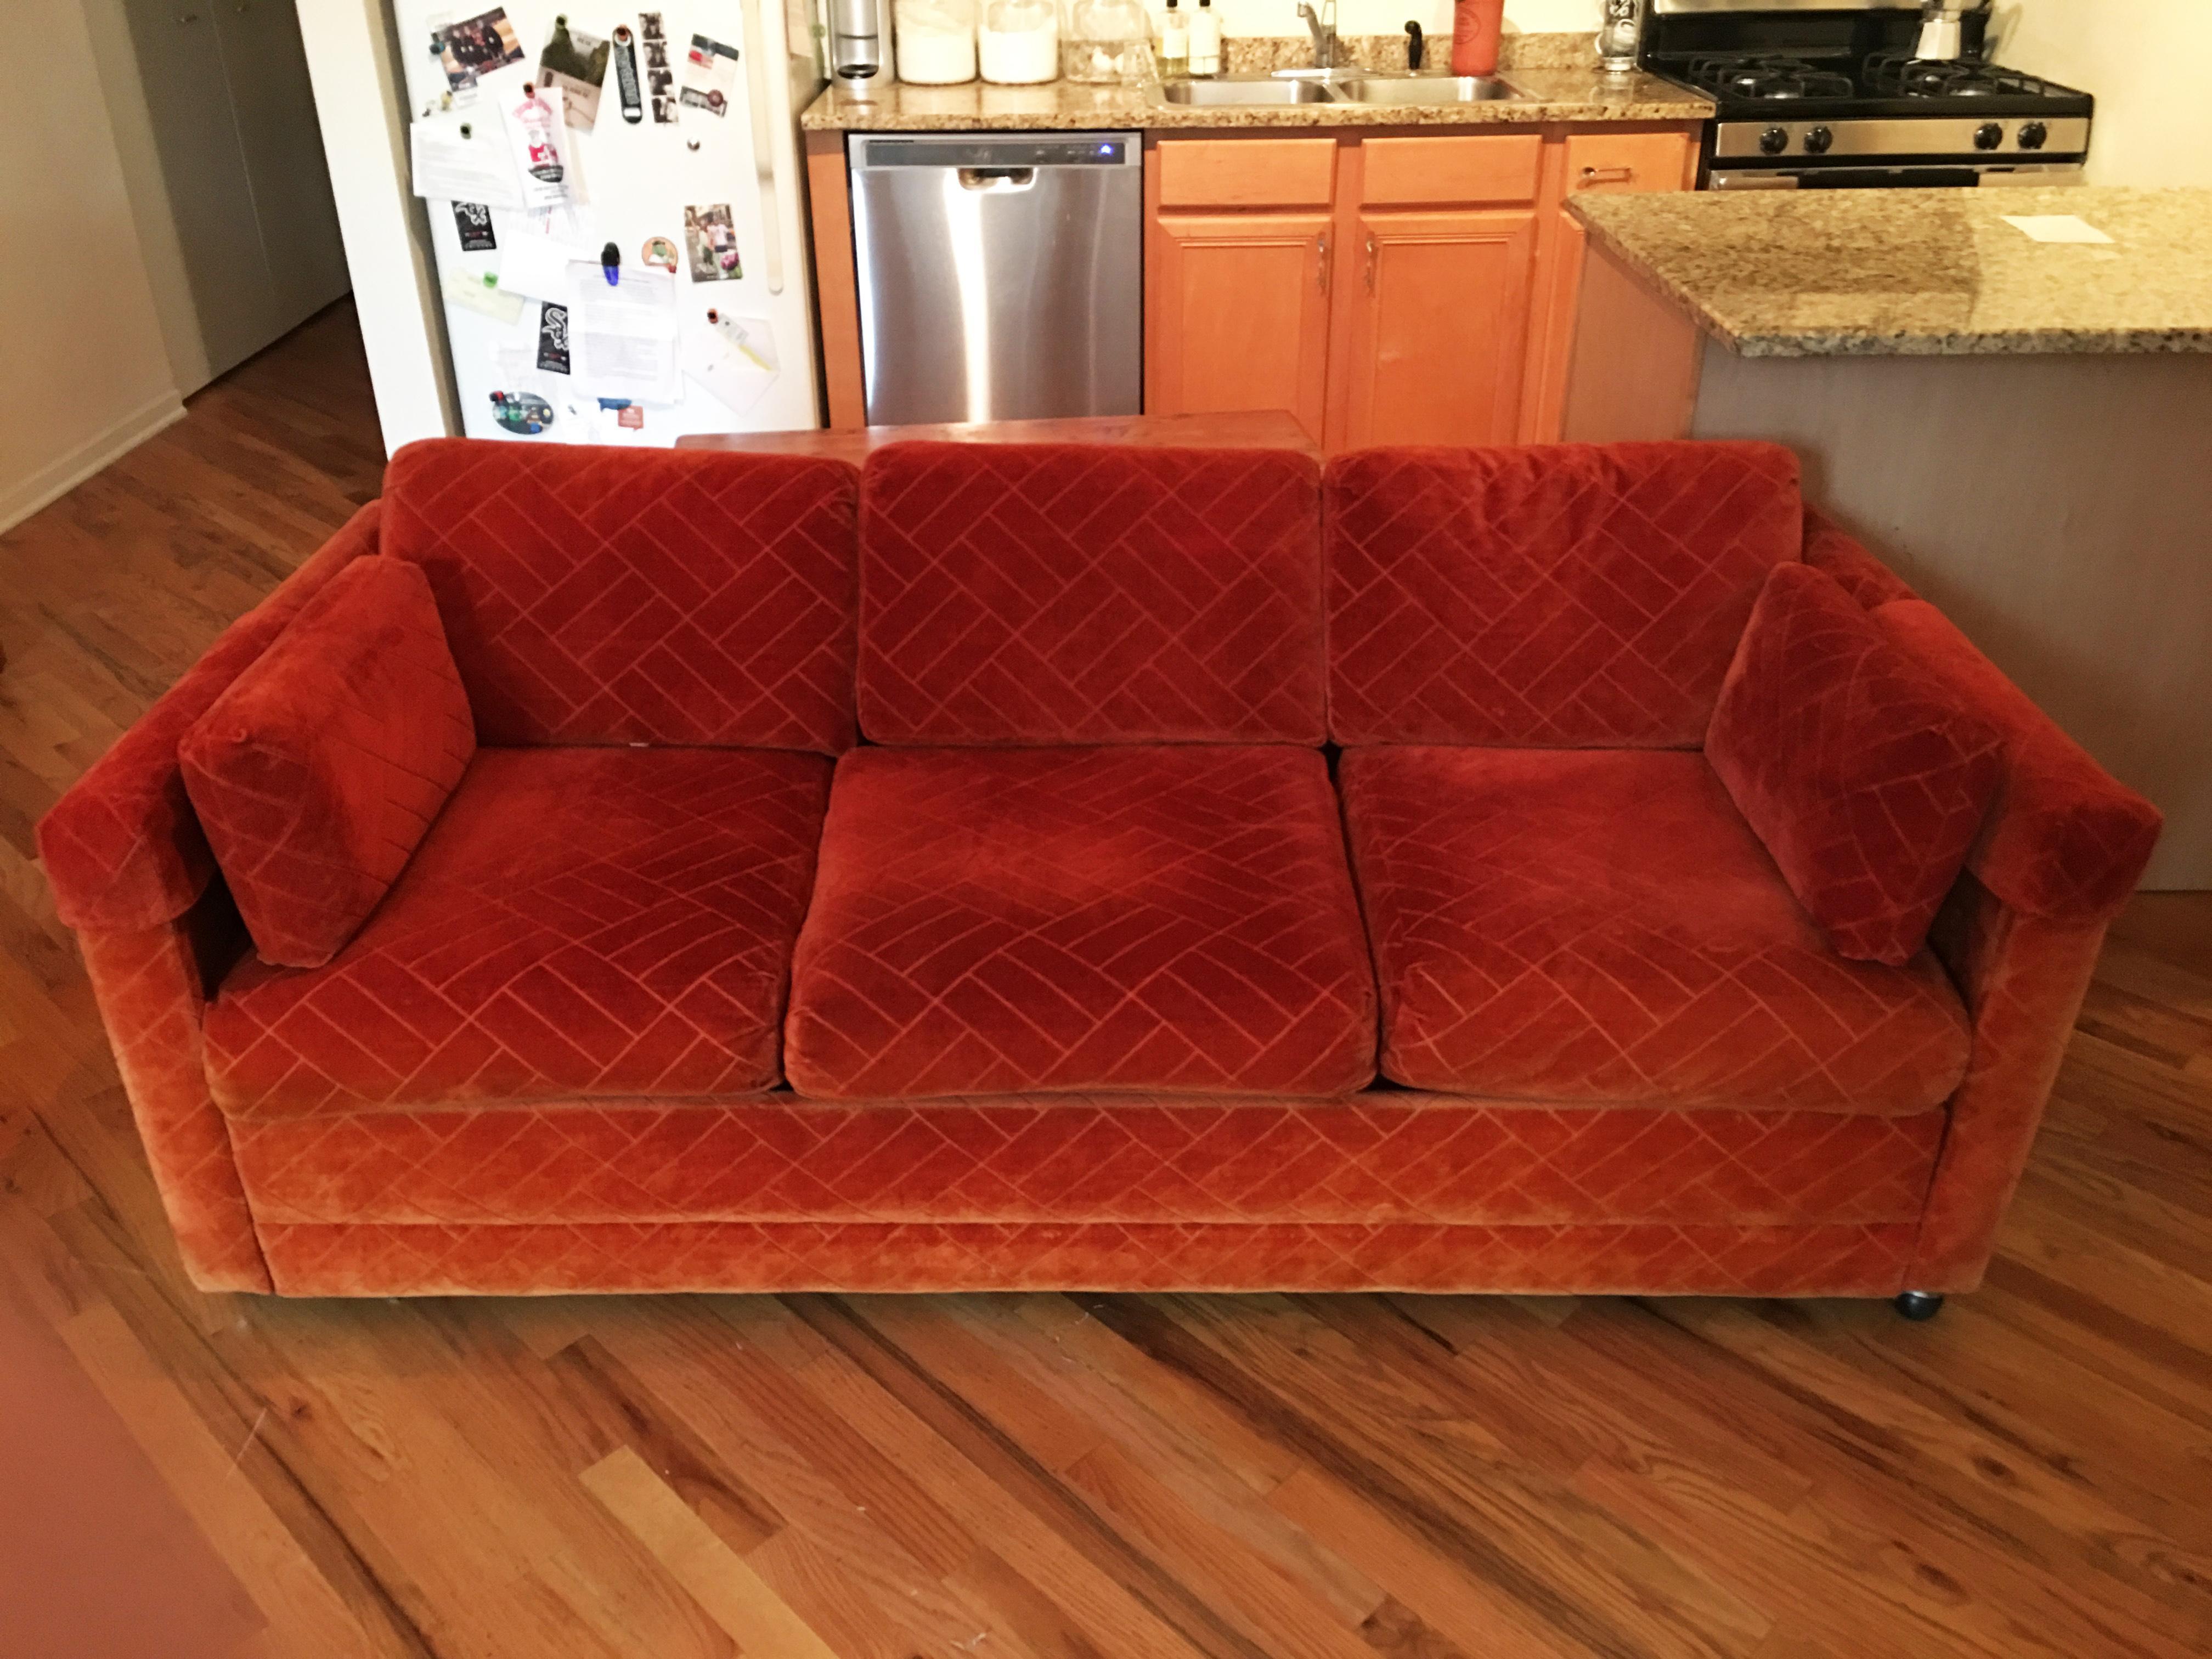 Amazing Mid Century Modern Vintage Retro Orange Pull Out Sleeper Sofa For Sale    Image 3